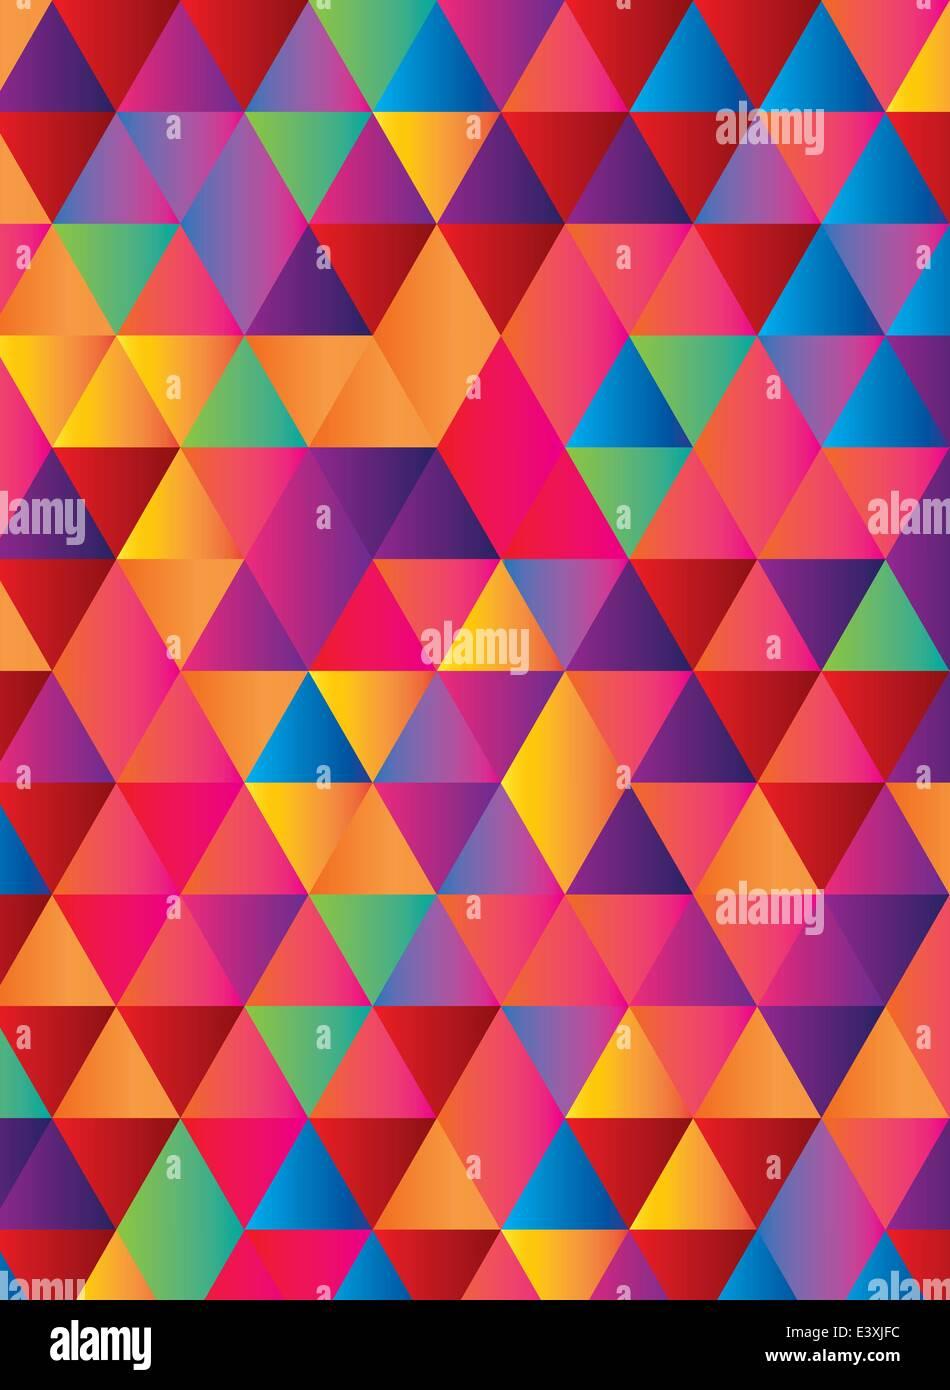 gradient background in geometric repeat pattern Stock Vector Art